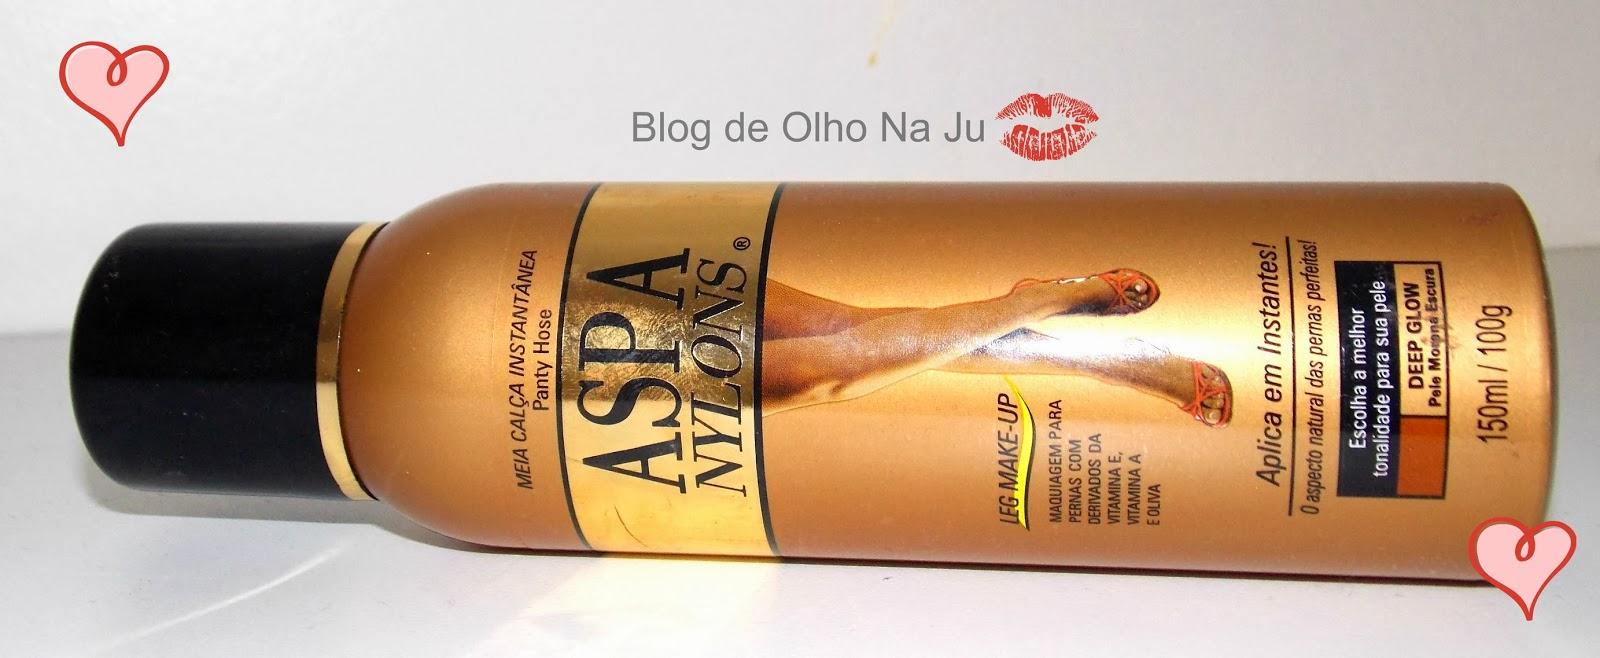 dbc478f84 De Olho Na Ju  Produto Aprovado  Meia Calça Instantânea - Aspa Nylons